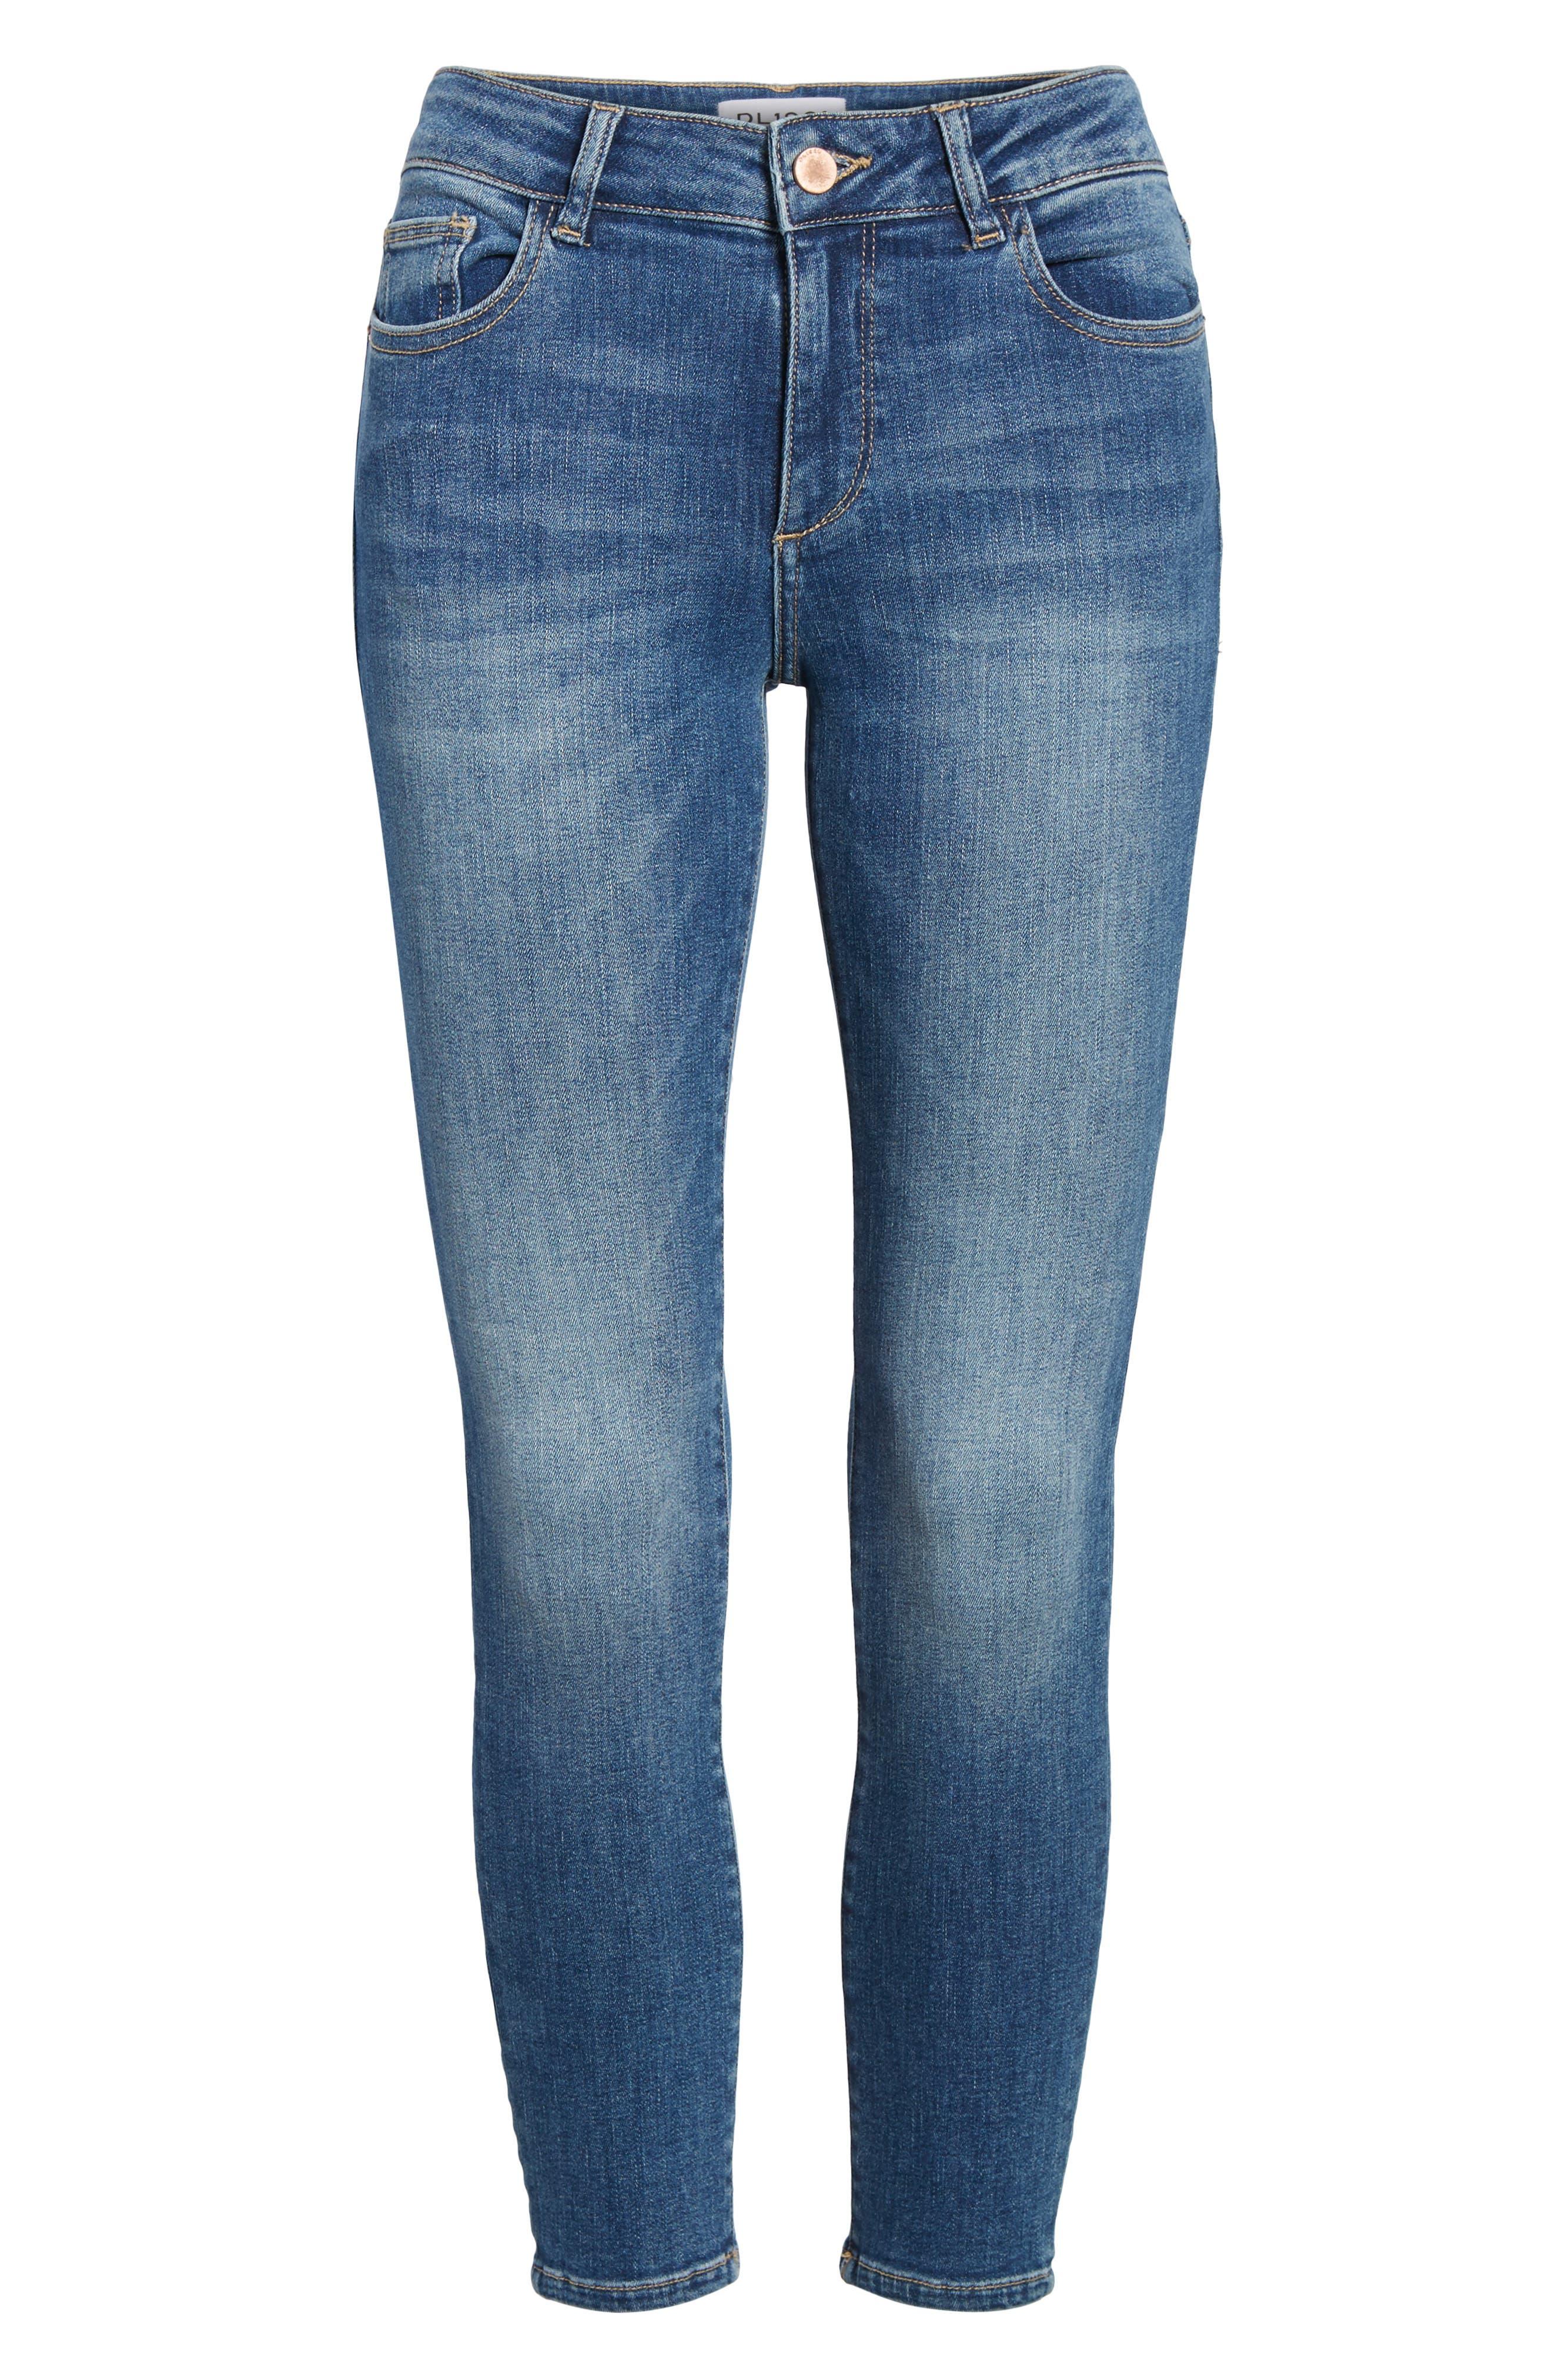 Florence Instasculpt Crop Skinny Jeans,                             Alternate thumbnail 7, color,                             EVERGLADE